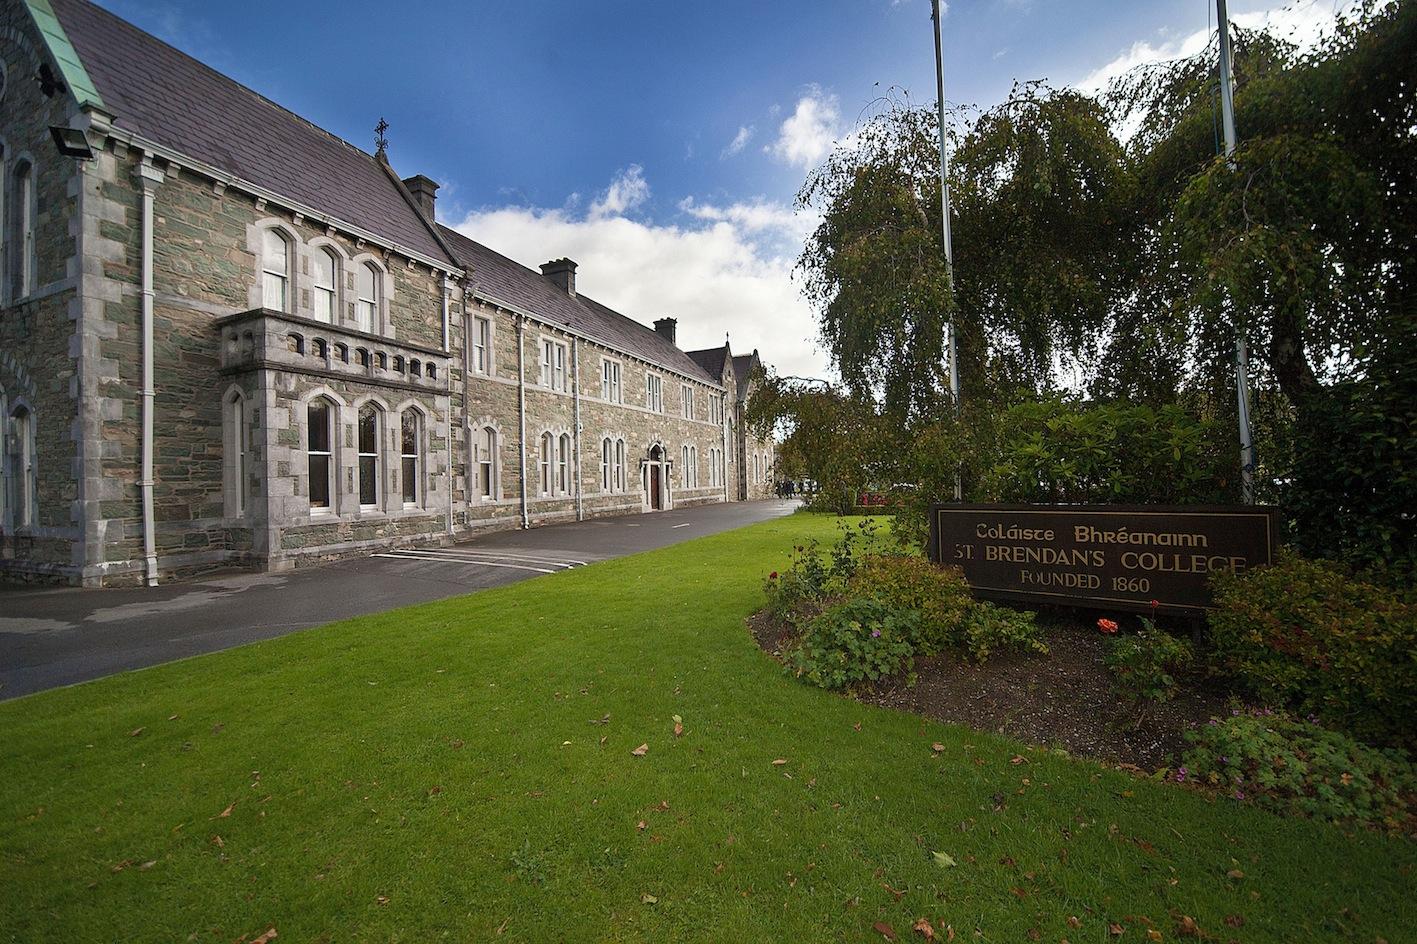 St Brendan's College.